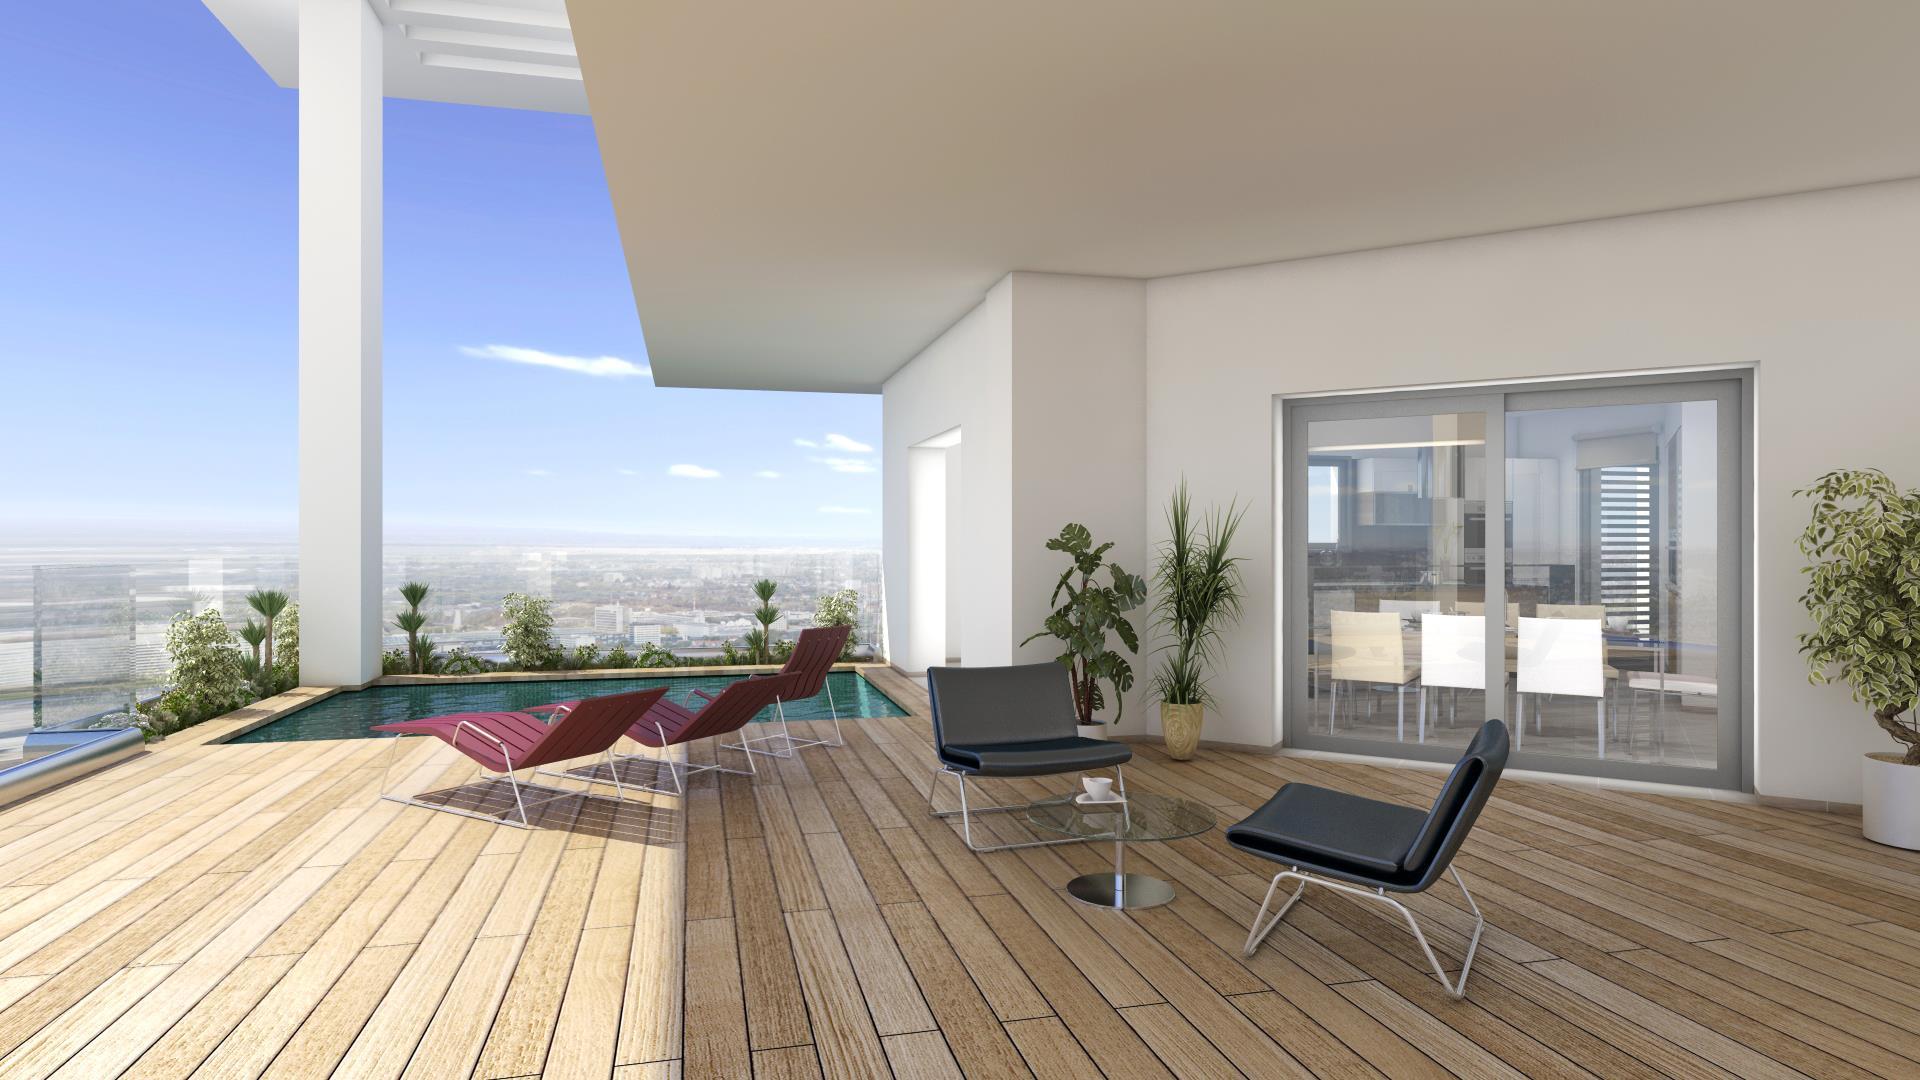 R sidence de haut standing au jardins de carthage r sidence khadija immobilier neuf tunisie - Residence de haut standing rubio ...